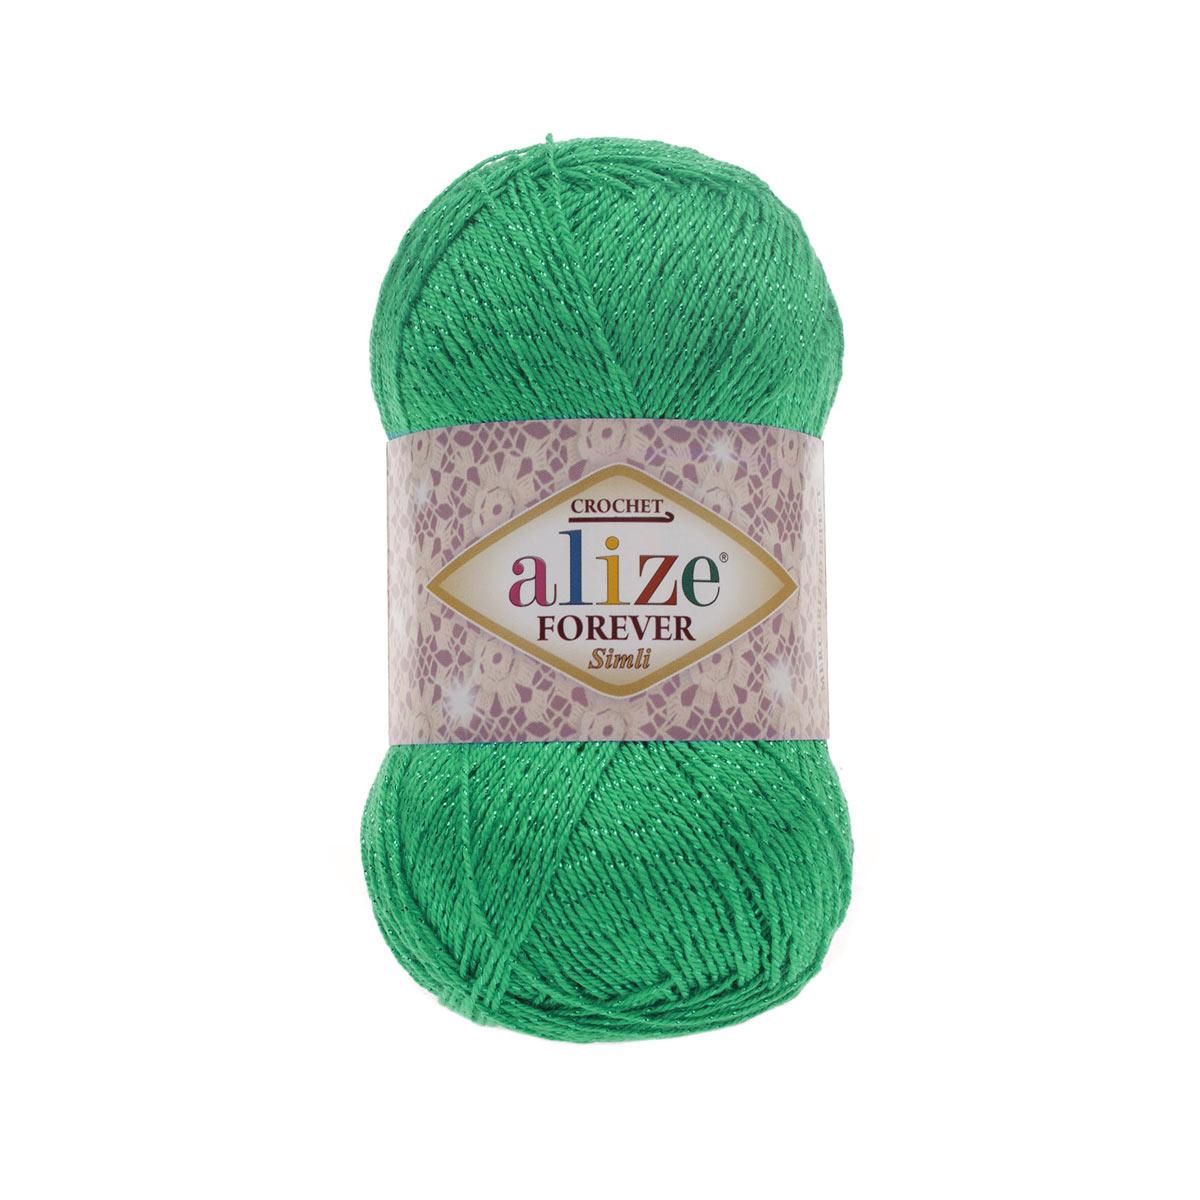 Пряжа ALIZE 'Forever crochet simli' 50гр. 280м. (96%микрофибра акрил,4%металик)ТУ